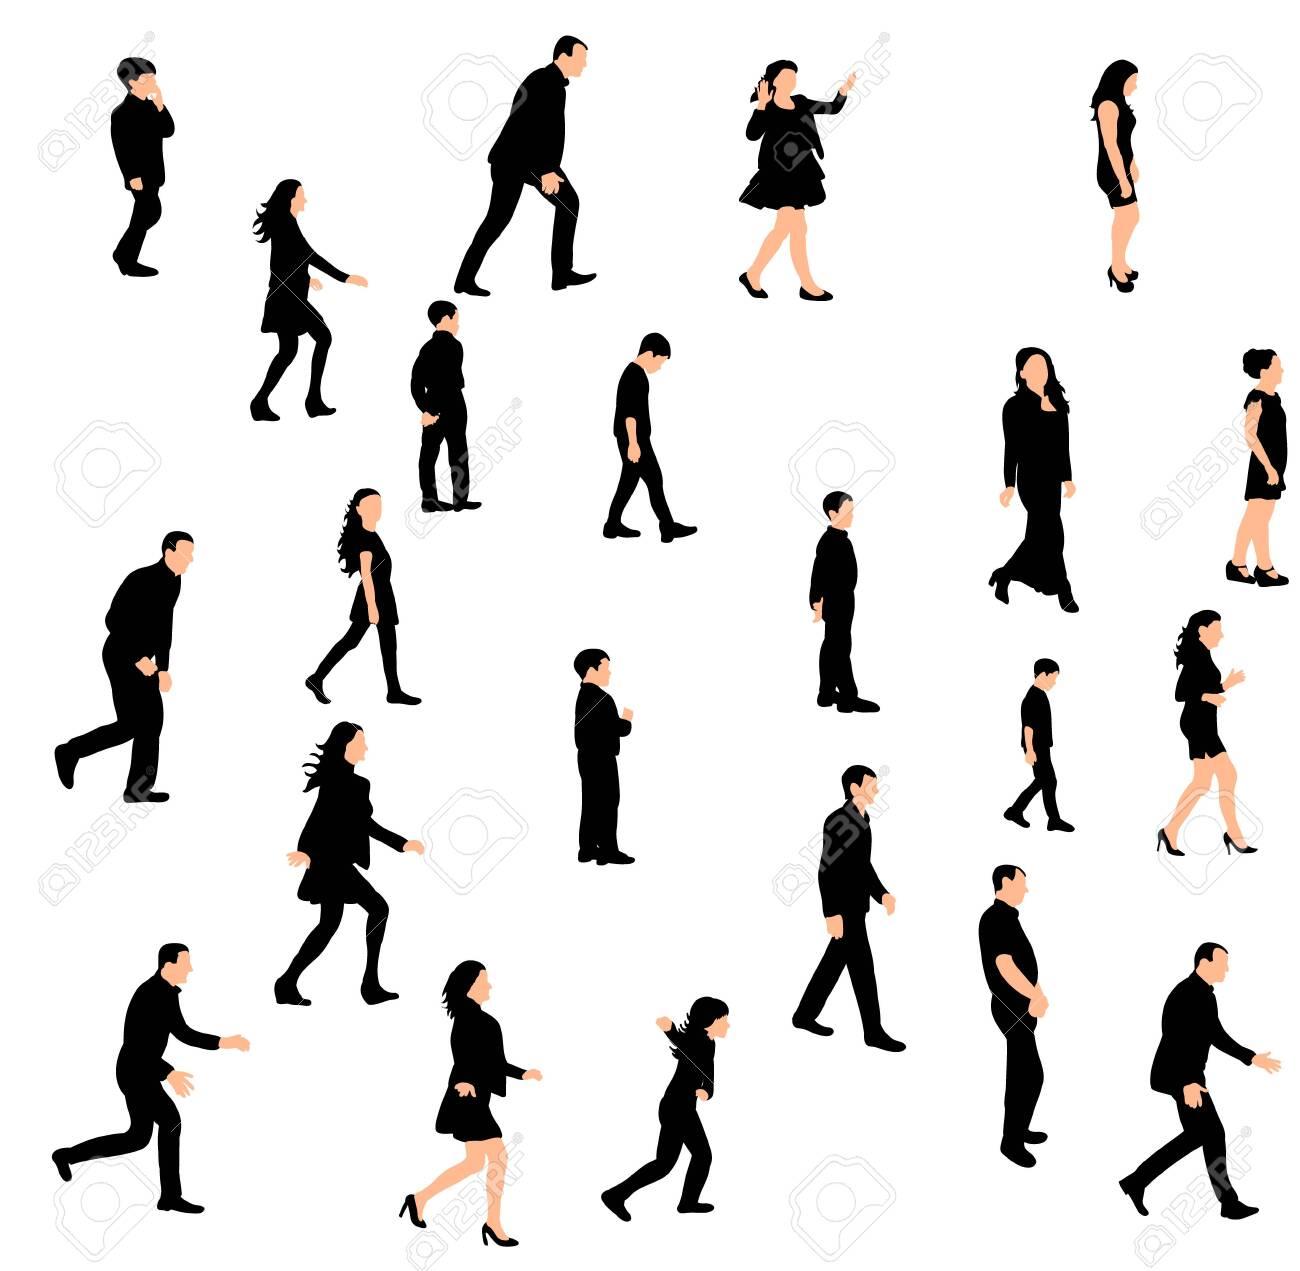 Vector, isolated silhouette people walking sideways set - 153888758